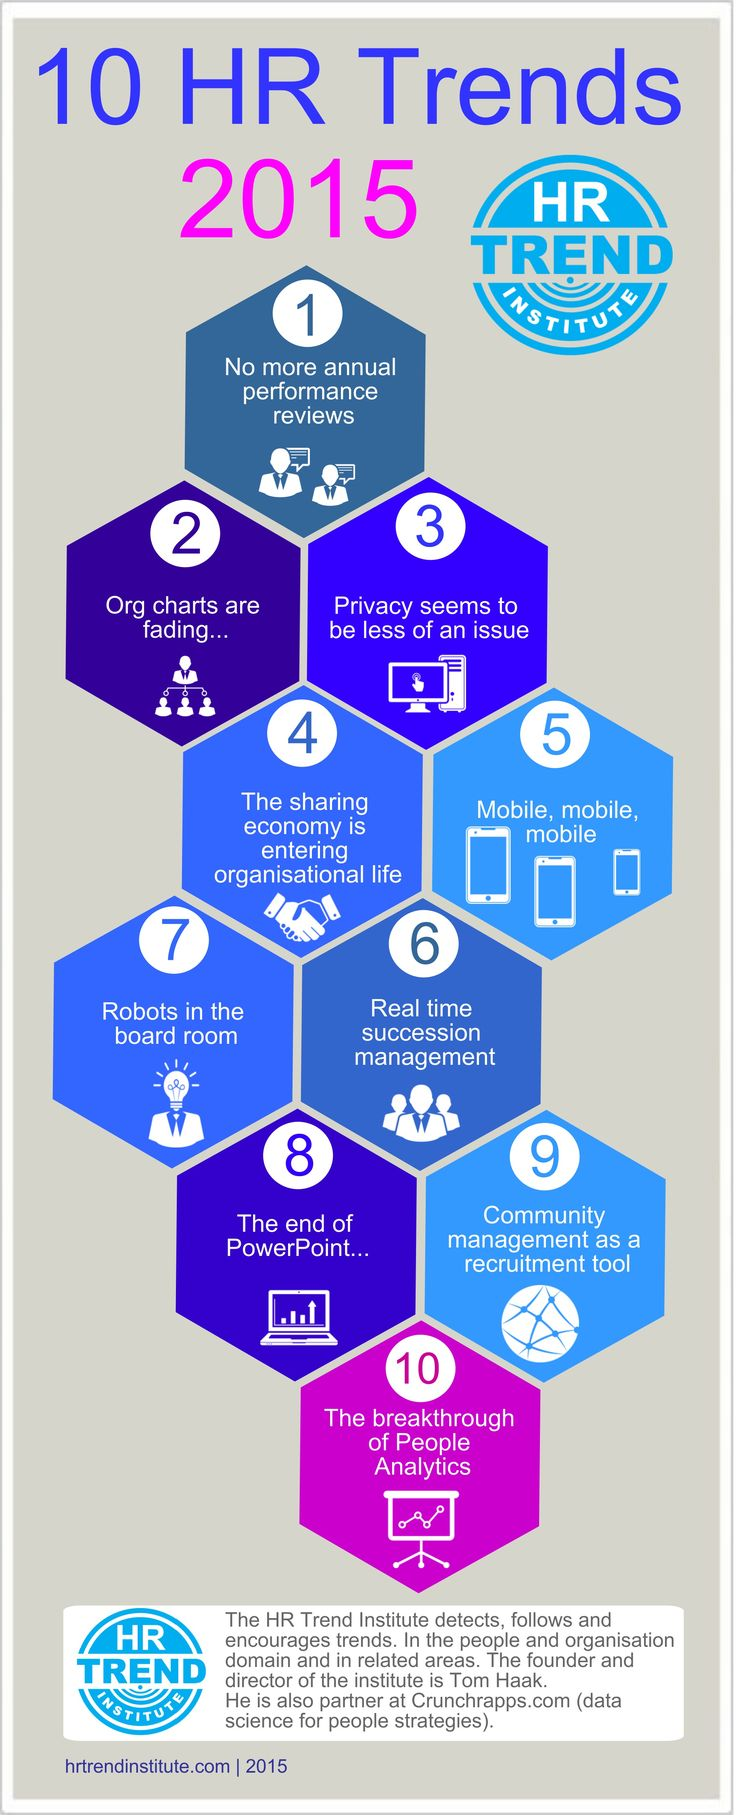 10 HR Trends 2015, HR Trend Institute (http://hrtrendinstitute.com)